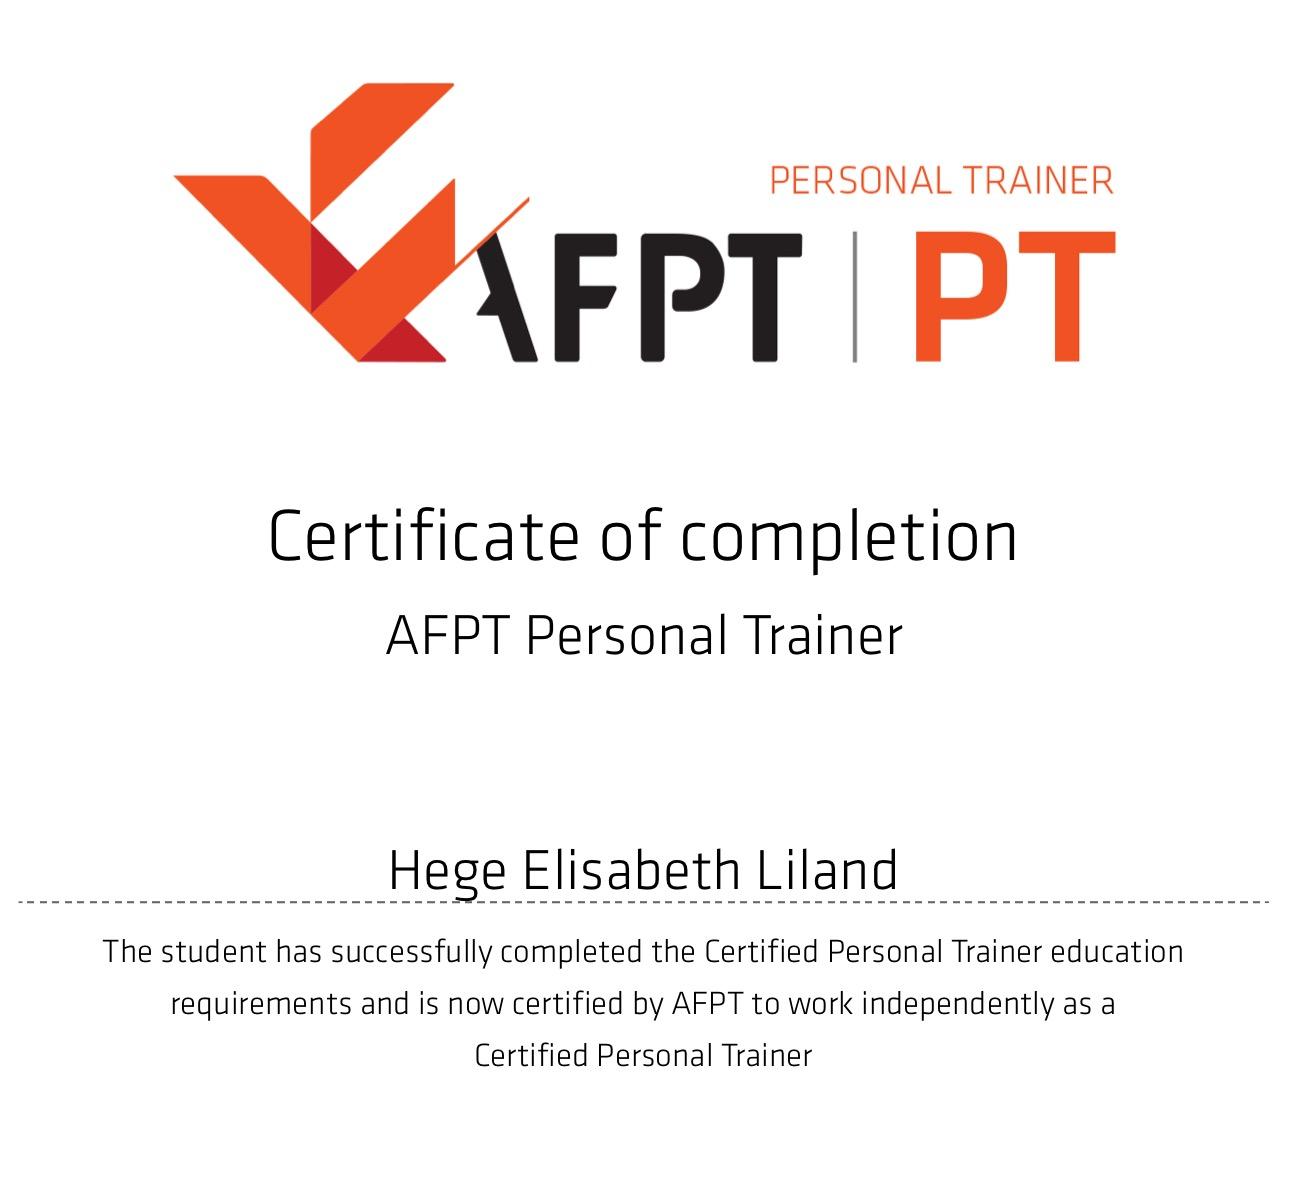 AFPT Personal Trainer - Sertifisering